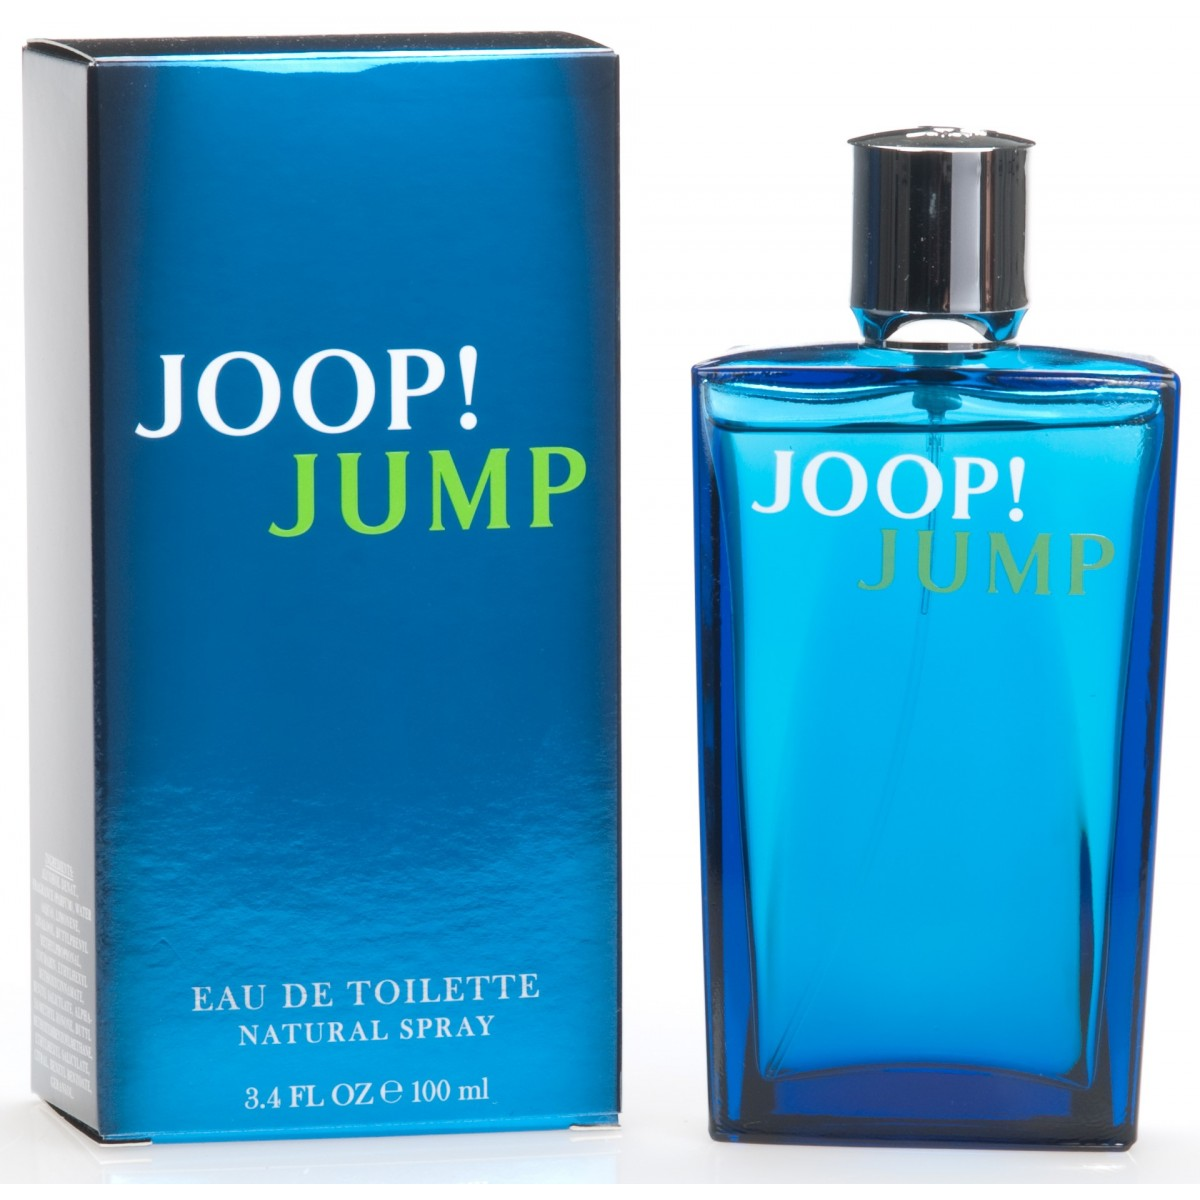 Joop jump eau de toilette 100ml vaporizador